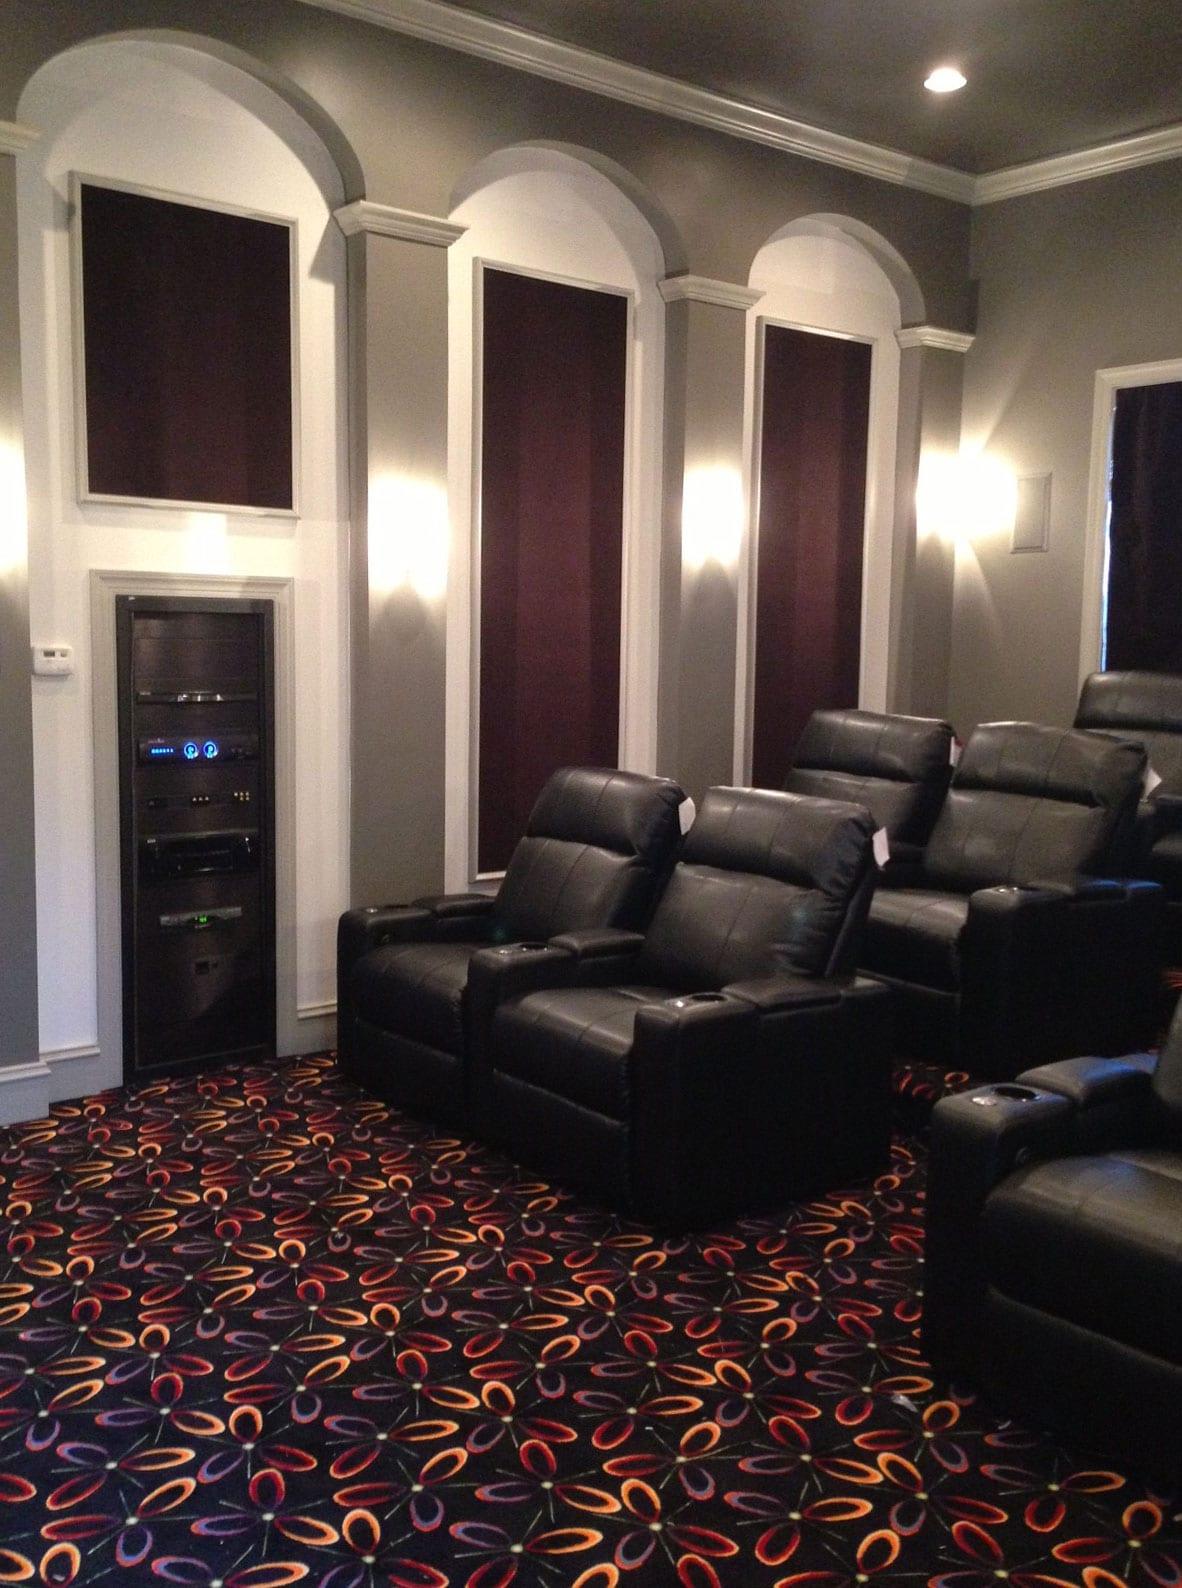 palmetto-audio-video-custom-home-theater